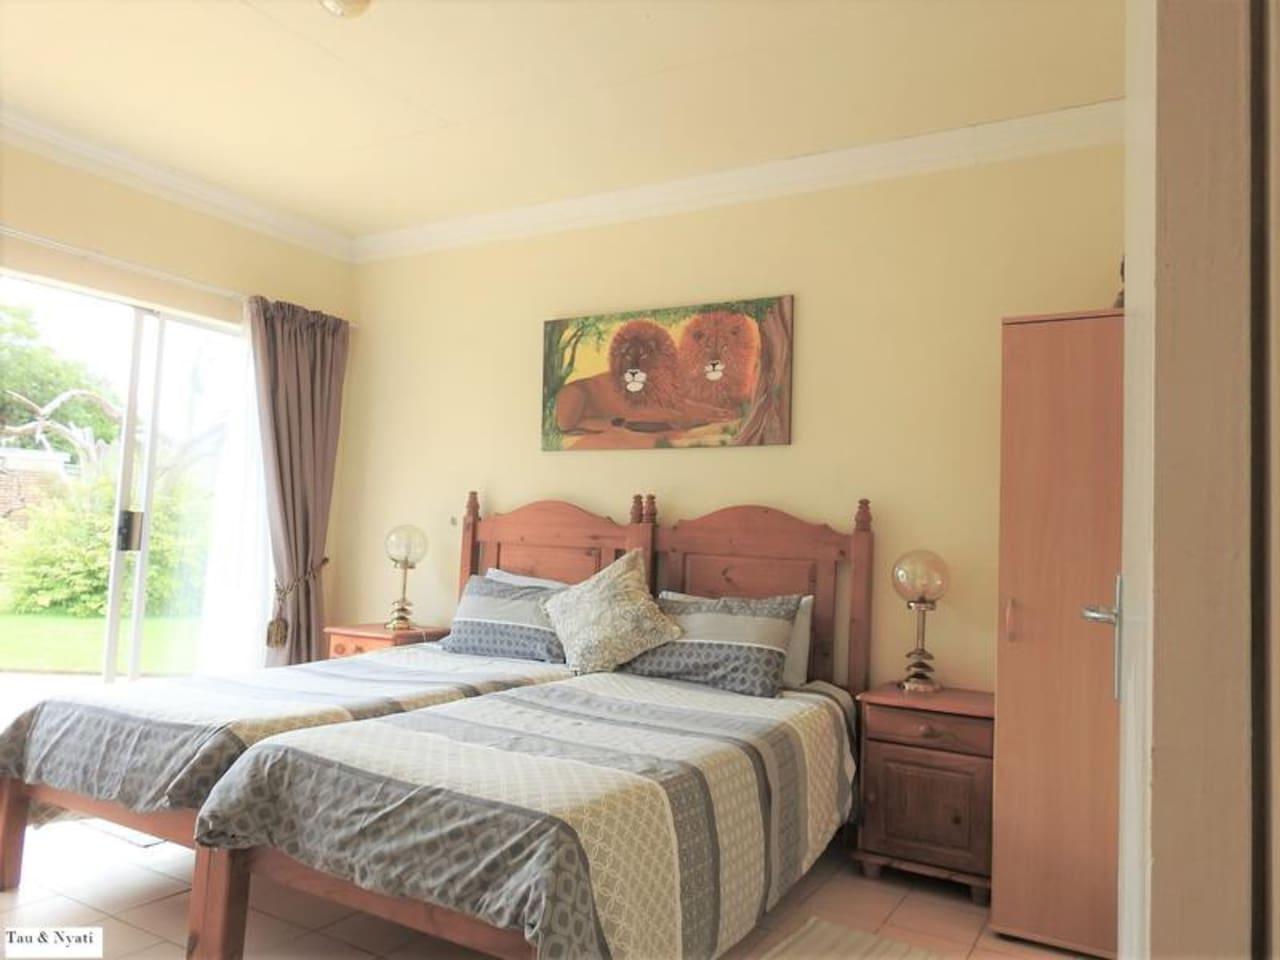 Tau & Nyati Room photo 0